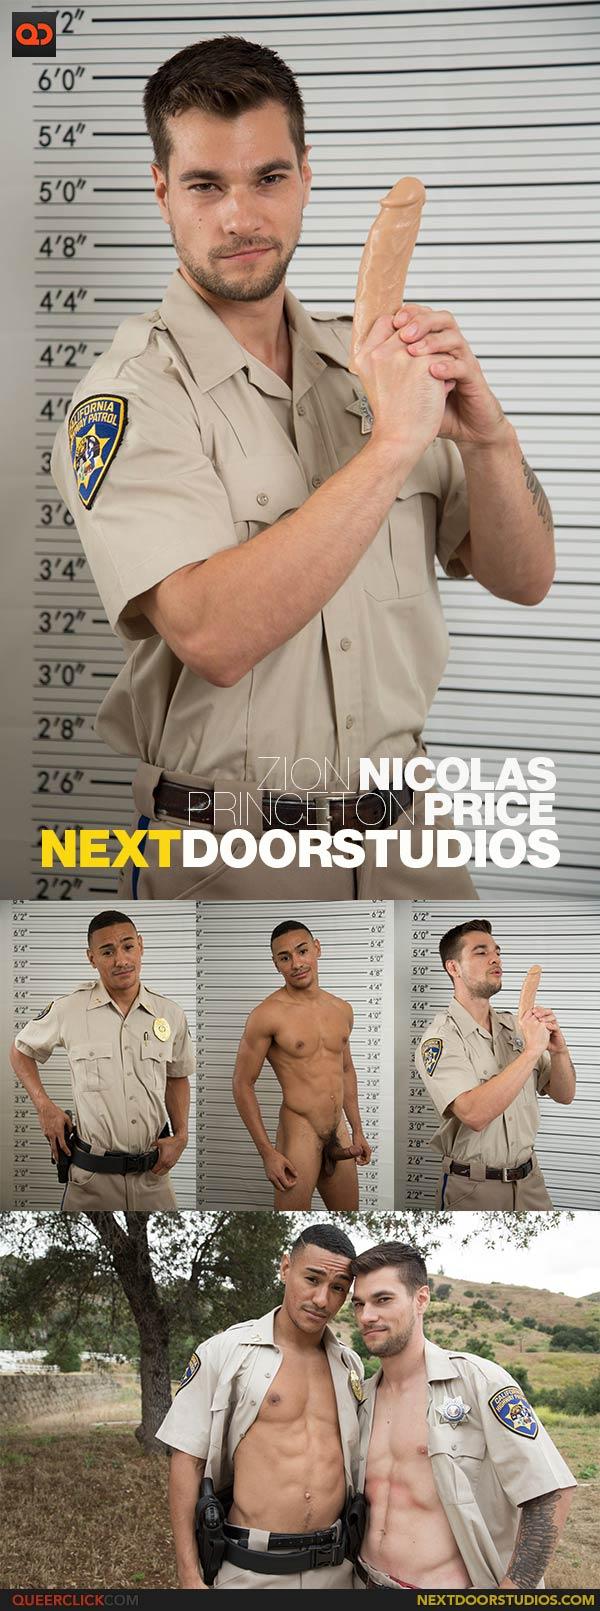 Next Door Studios:  Princeton Price and Zion Nicholas